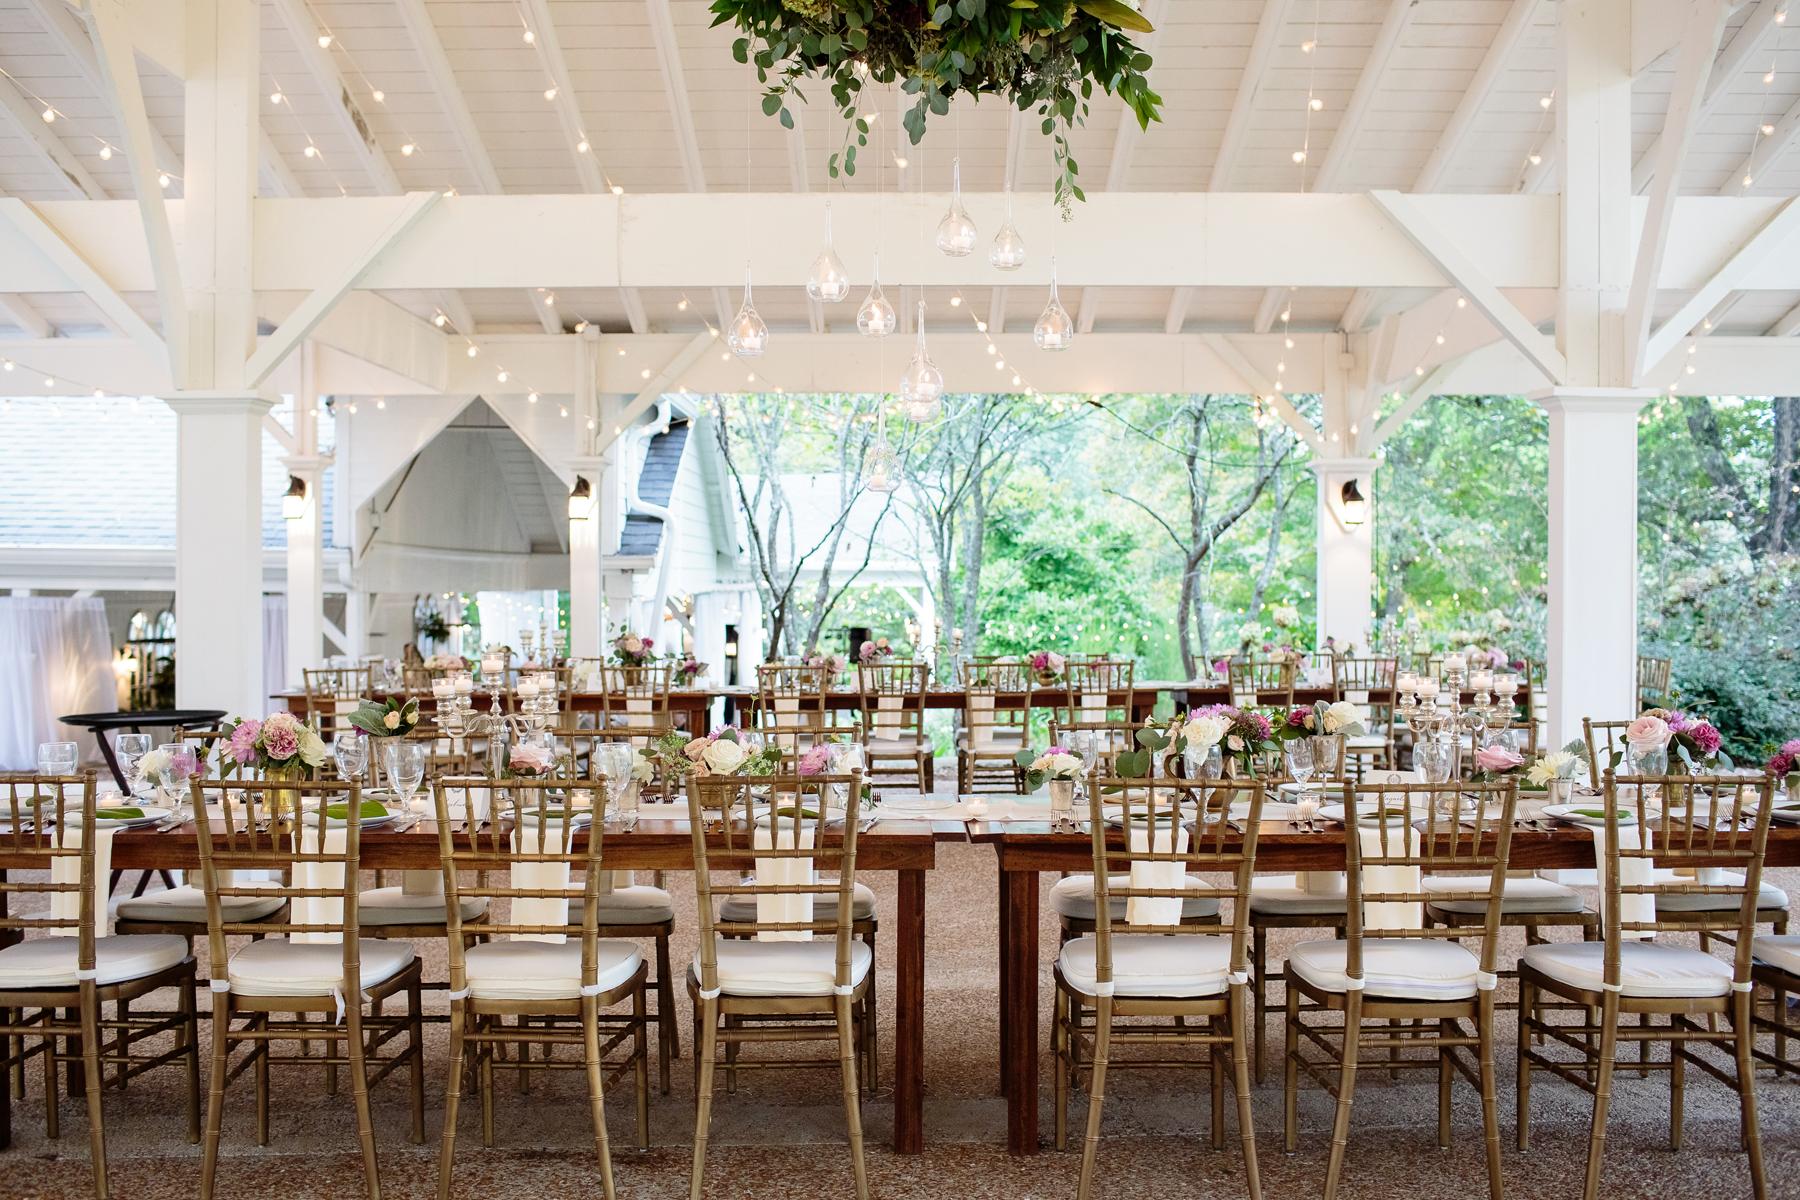 Wooden Wedding Tables Under String Lights